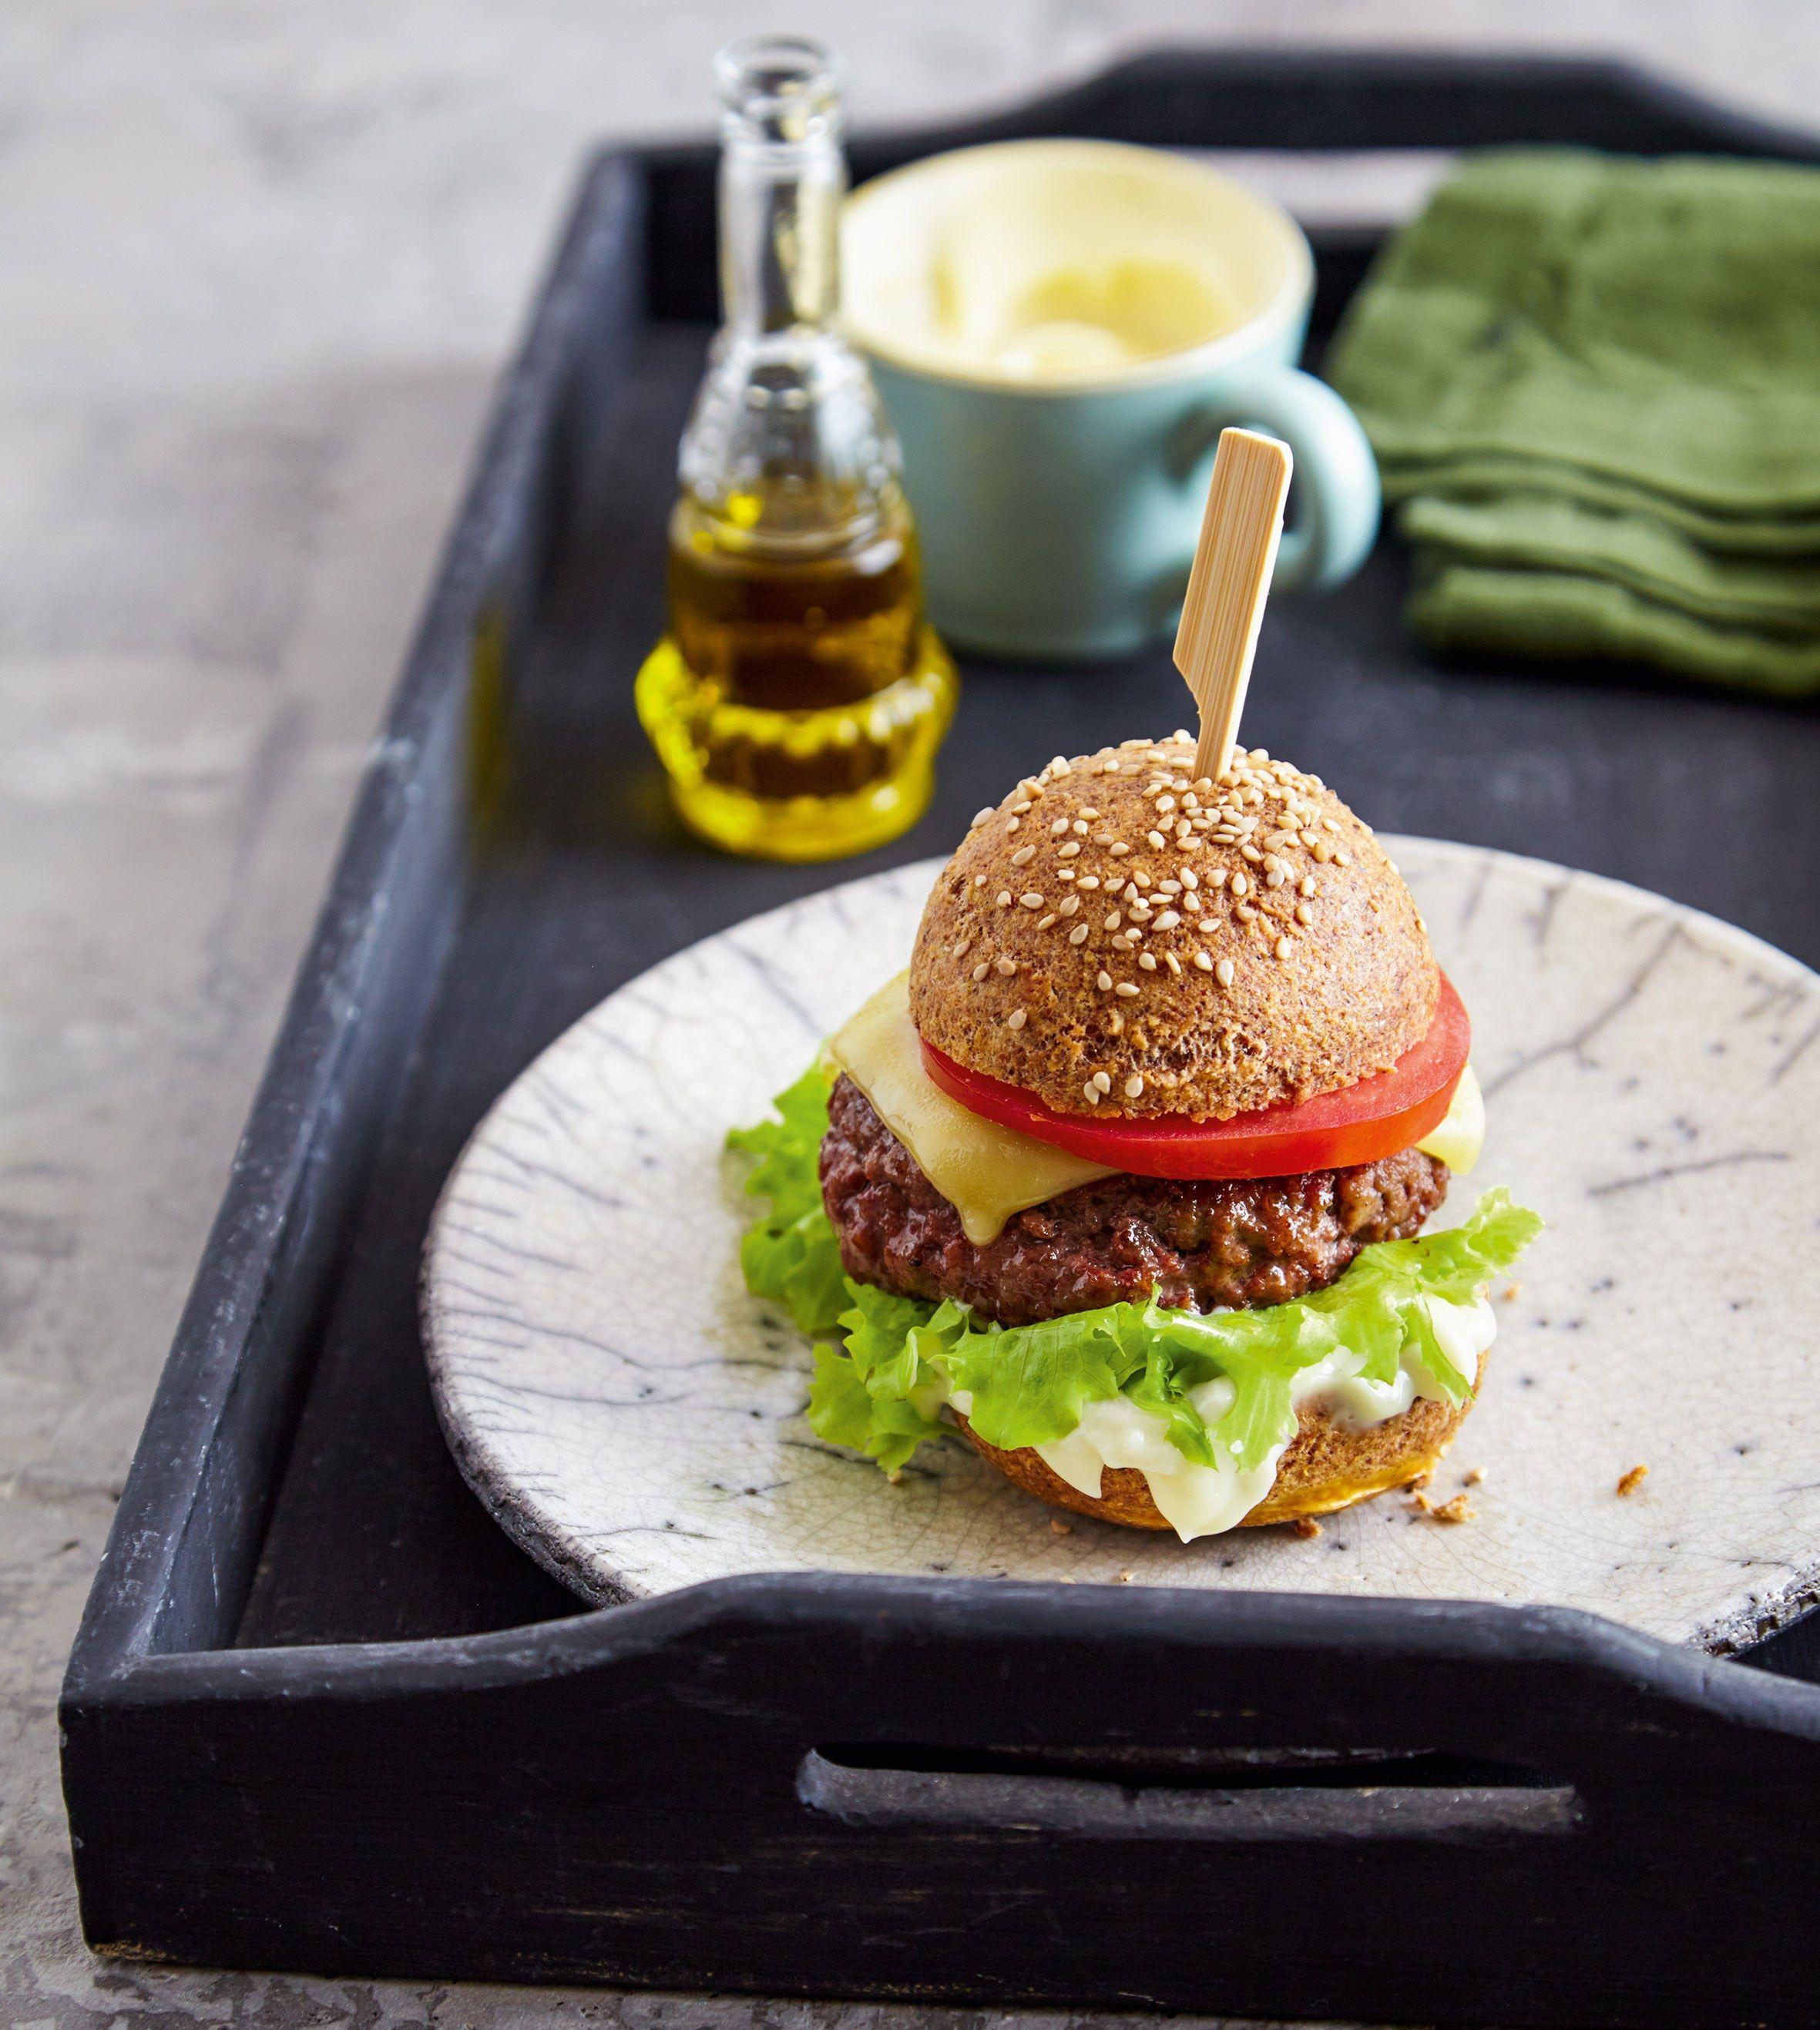 Low-Carb-Burger: So Lecker Schmeckt Das Fastfood Ohne